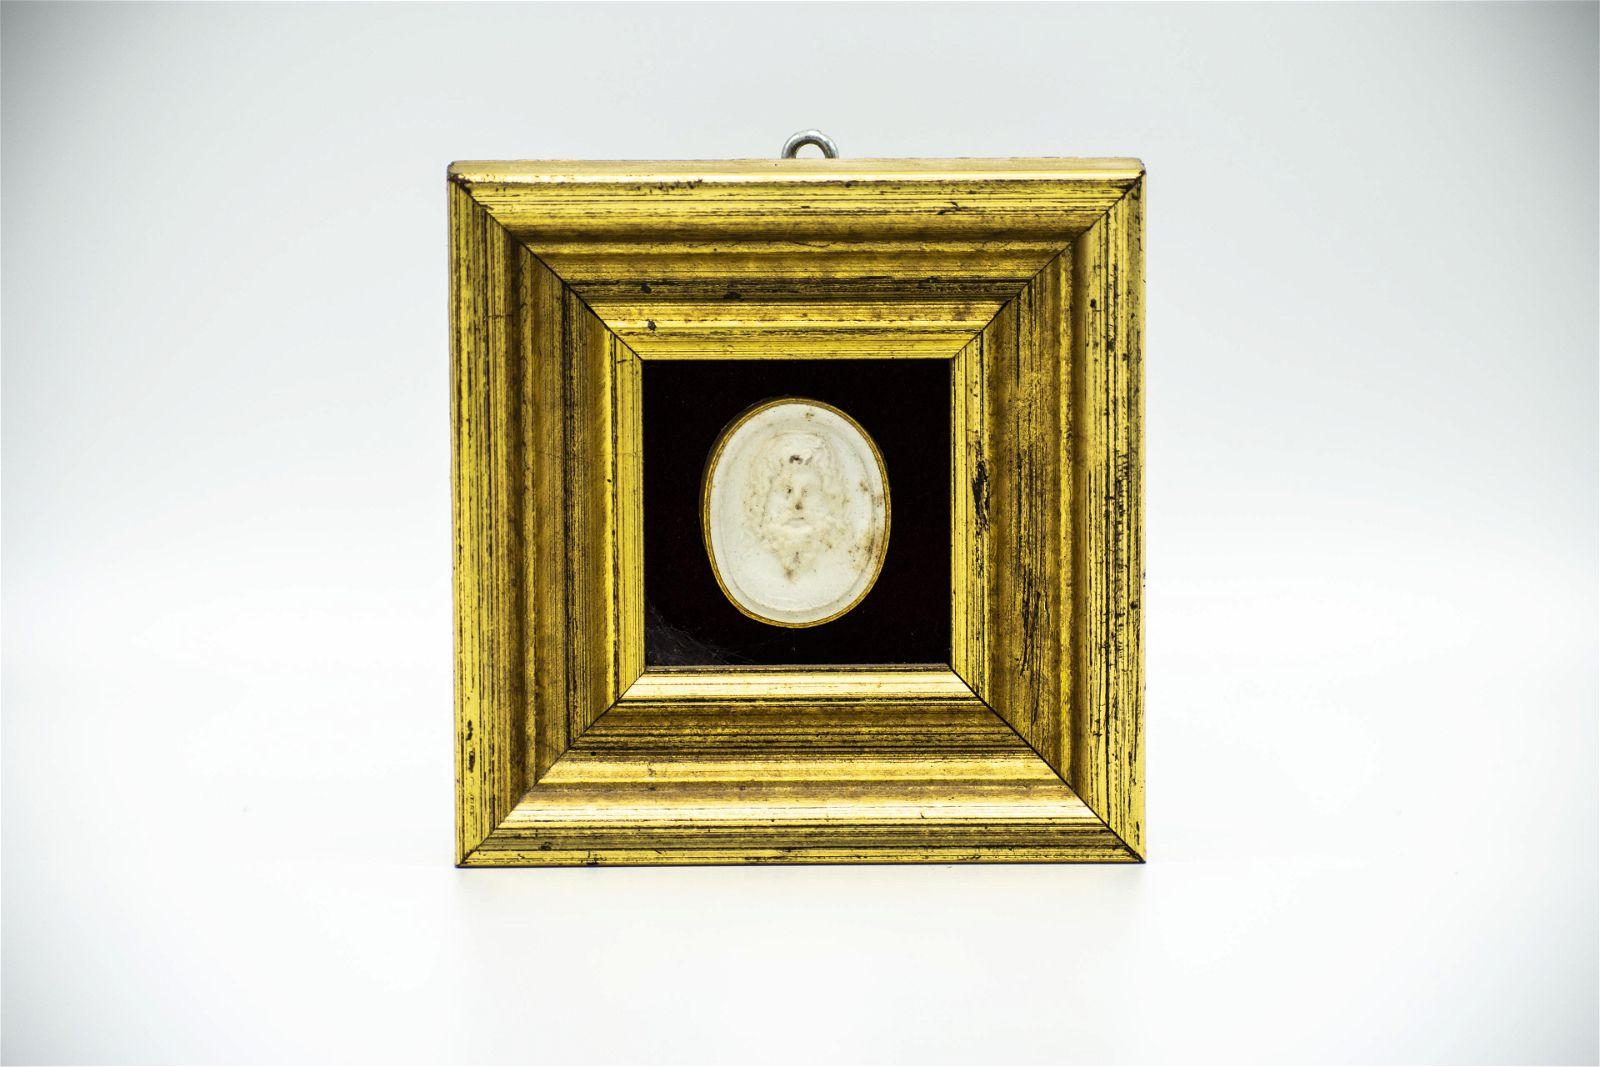 Italian Plaster Intaglio Miniature